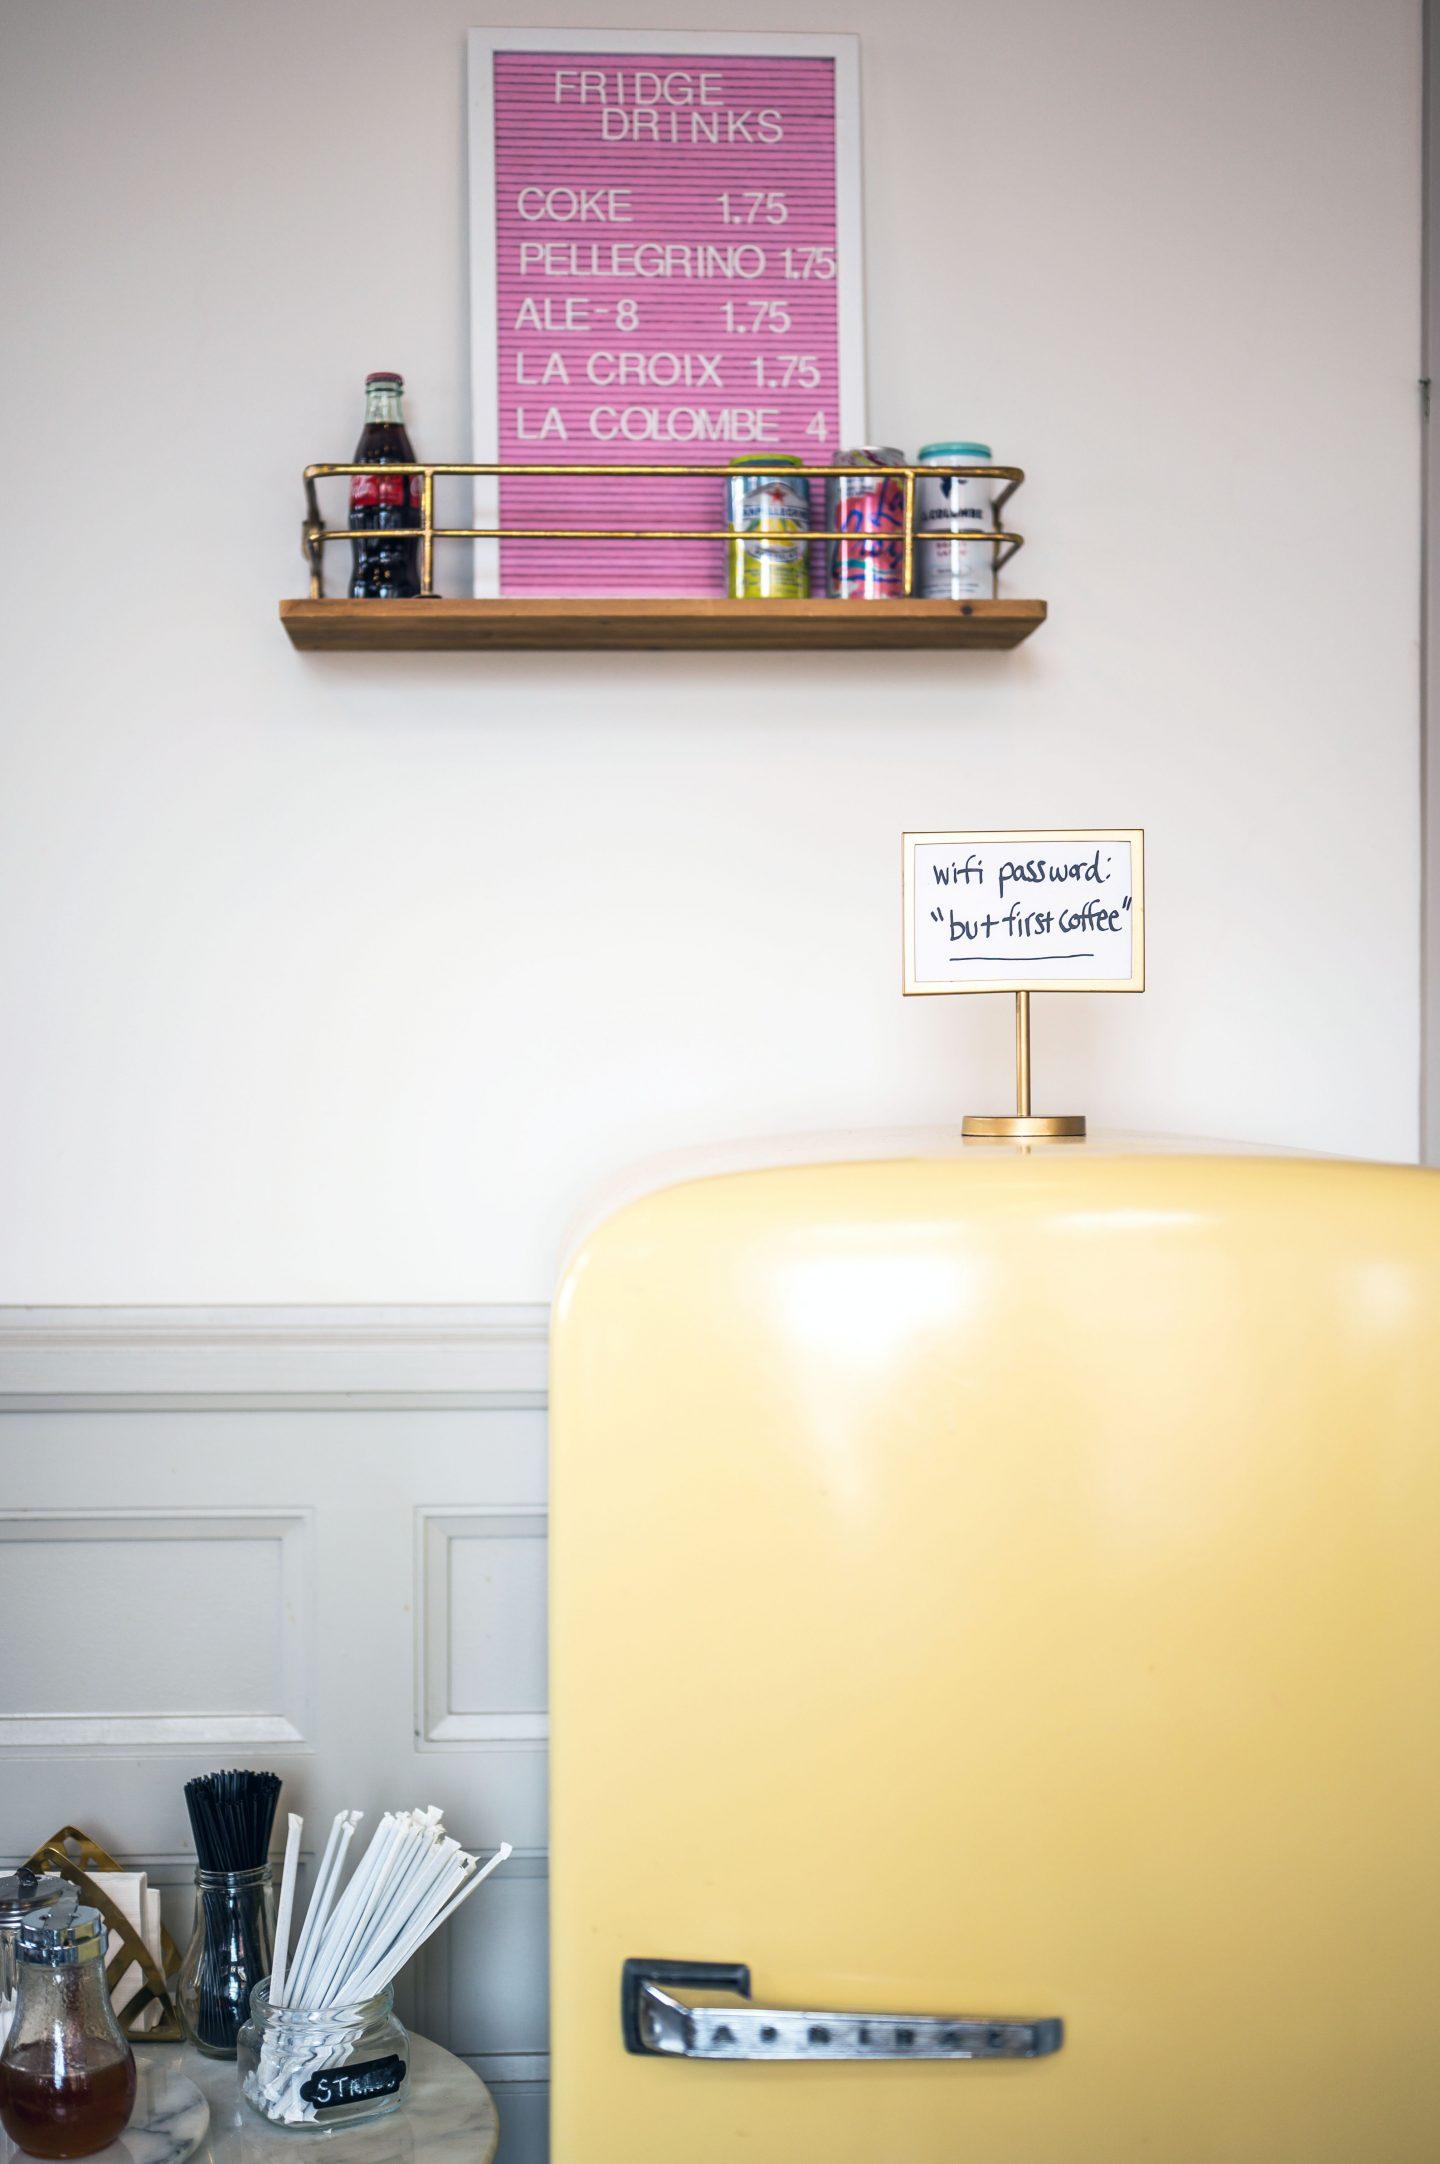 Vintage yellow refrigerator